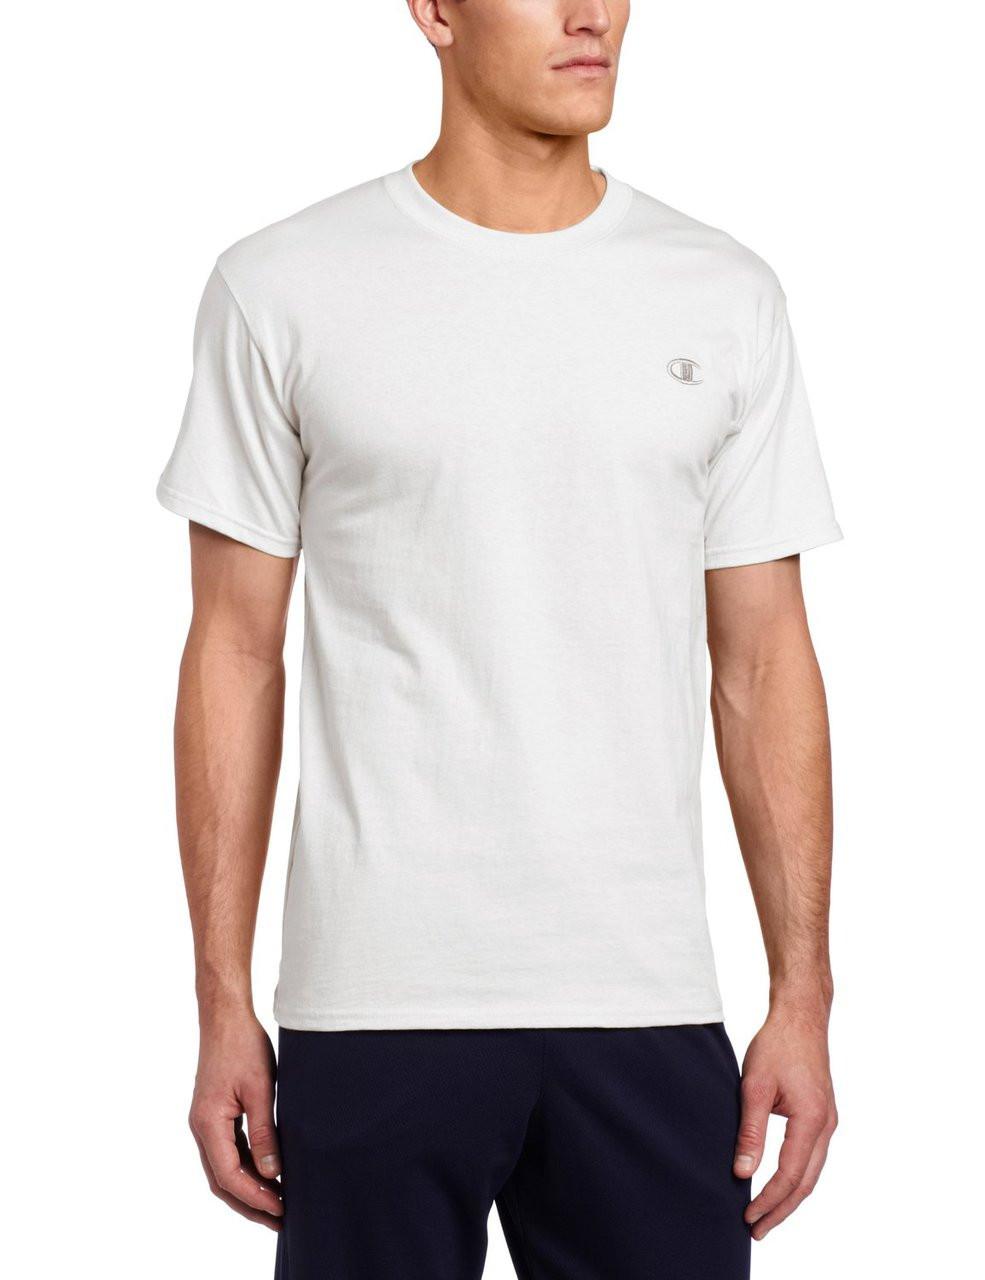 50dfcb46 Champion Men's Jersey T-Shirt - WHITE - TOPSHOPPING USA